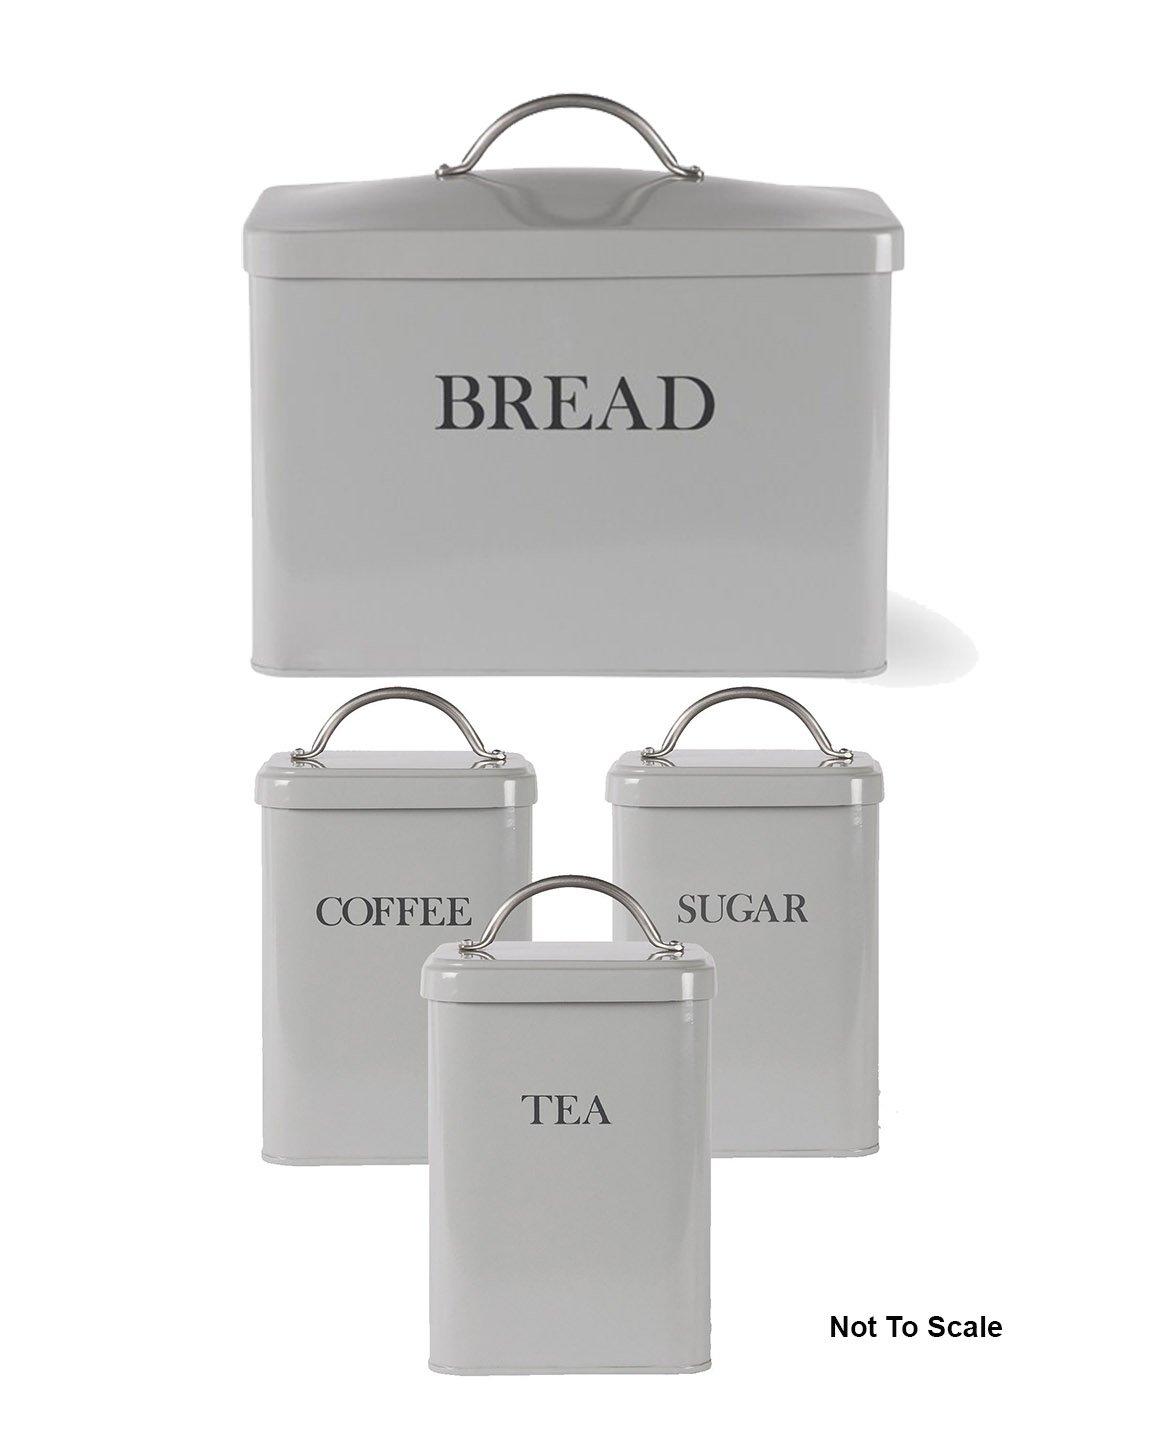 Garden Trading Bread Bin And Tea Coffee Sugar Canister Flint